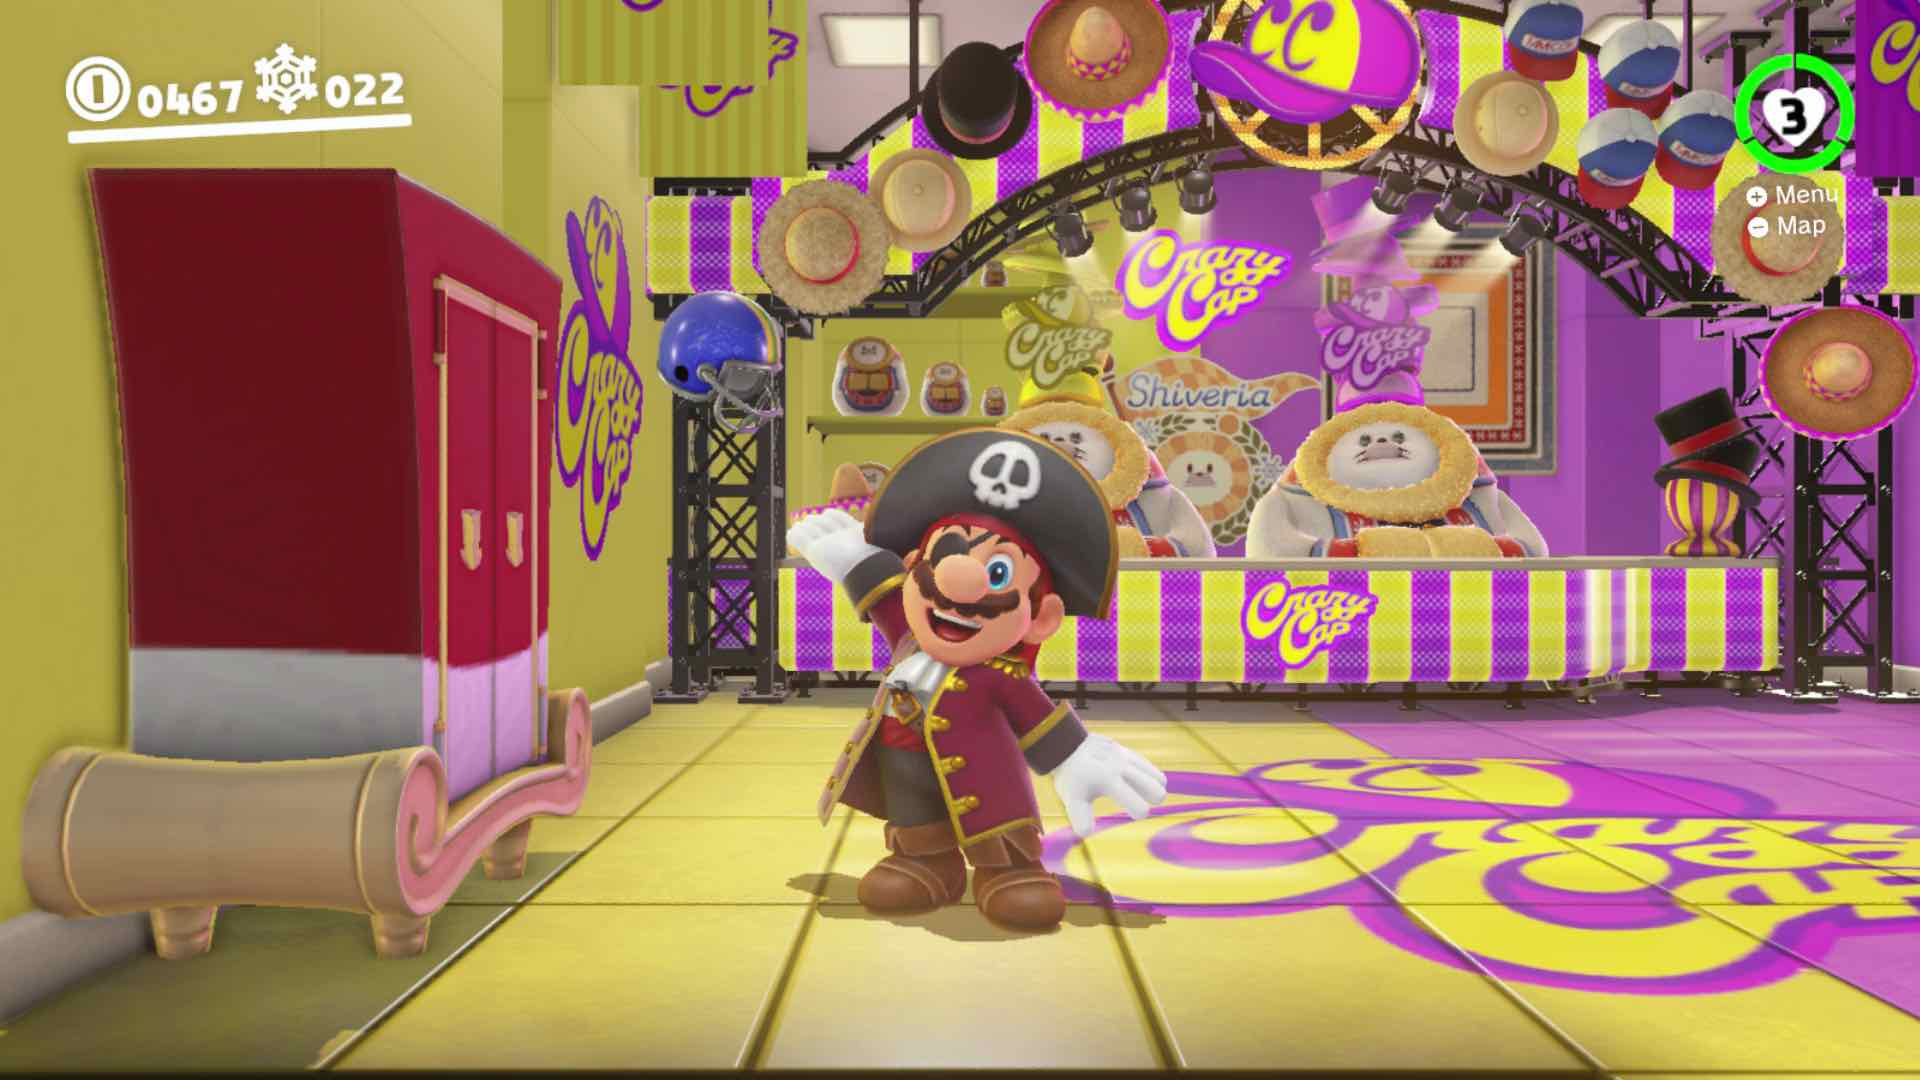 pirate-outfit-super-mario-odyssey-screenshot